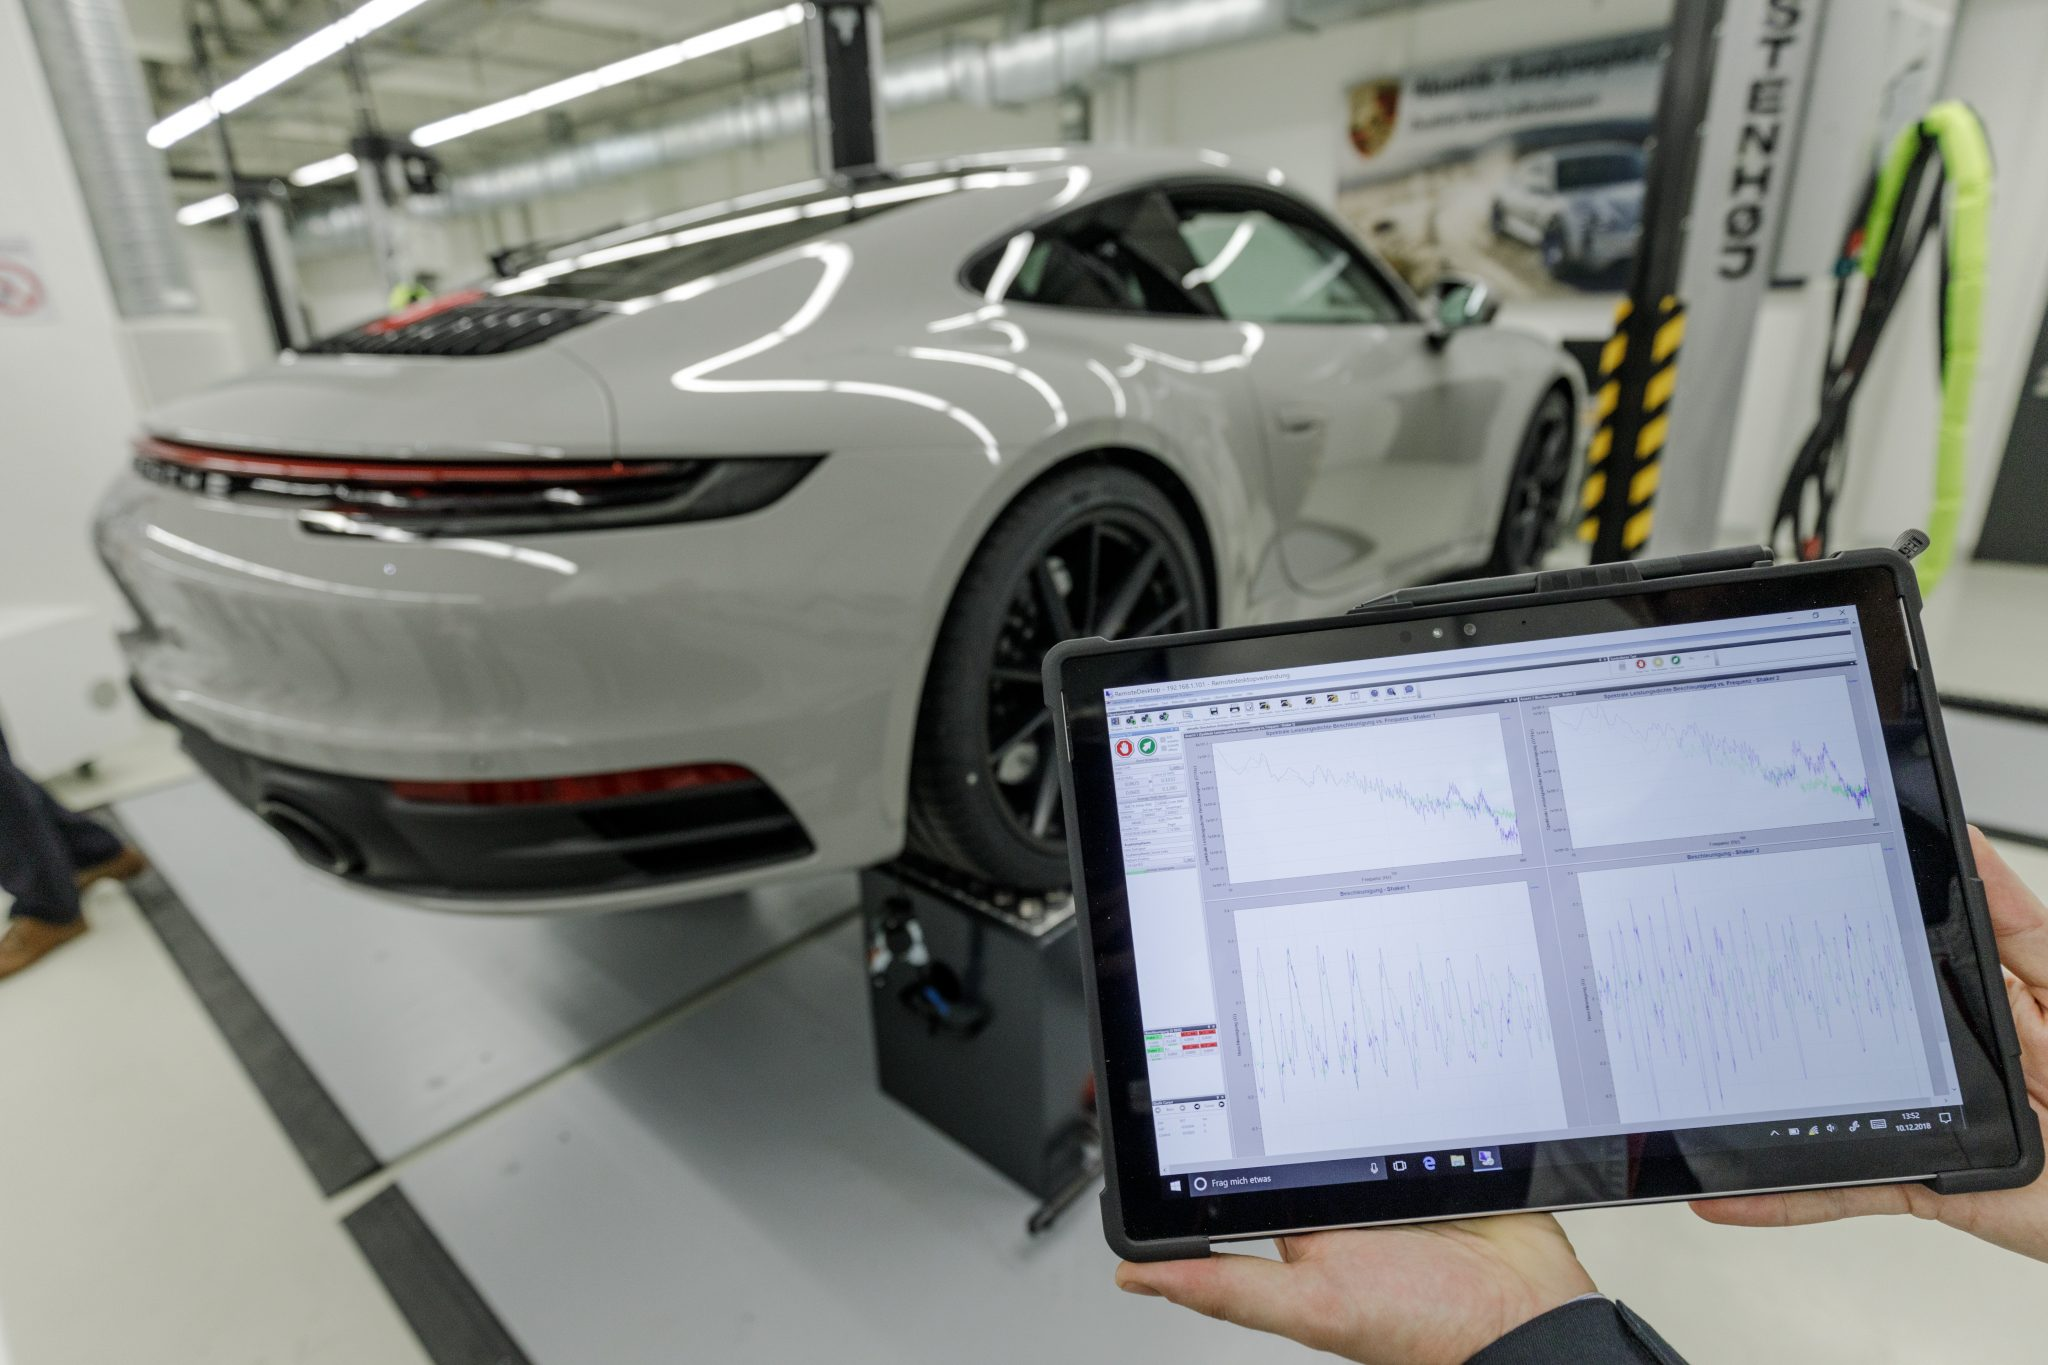 Porsche 911 992 tablet